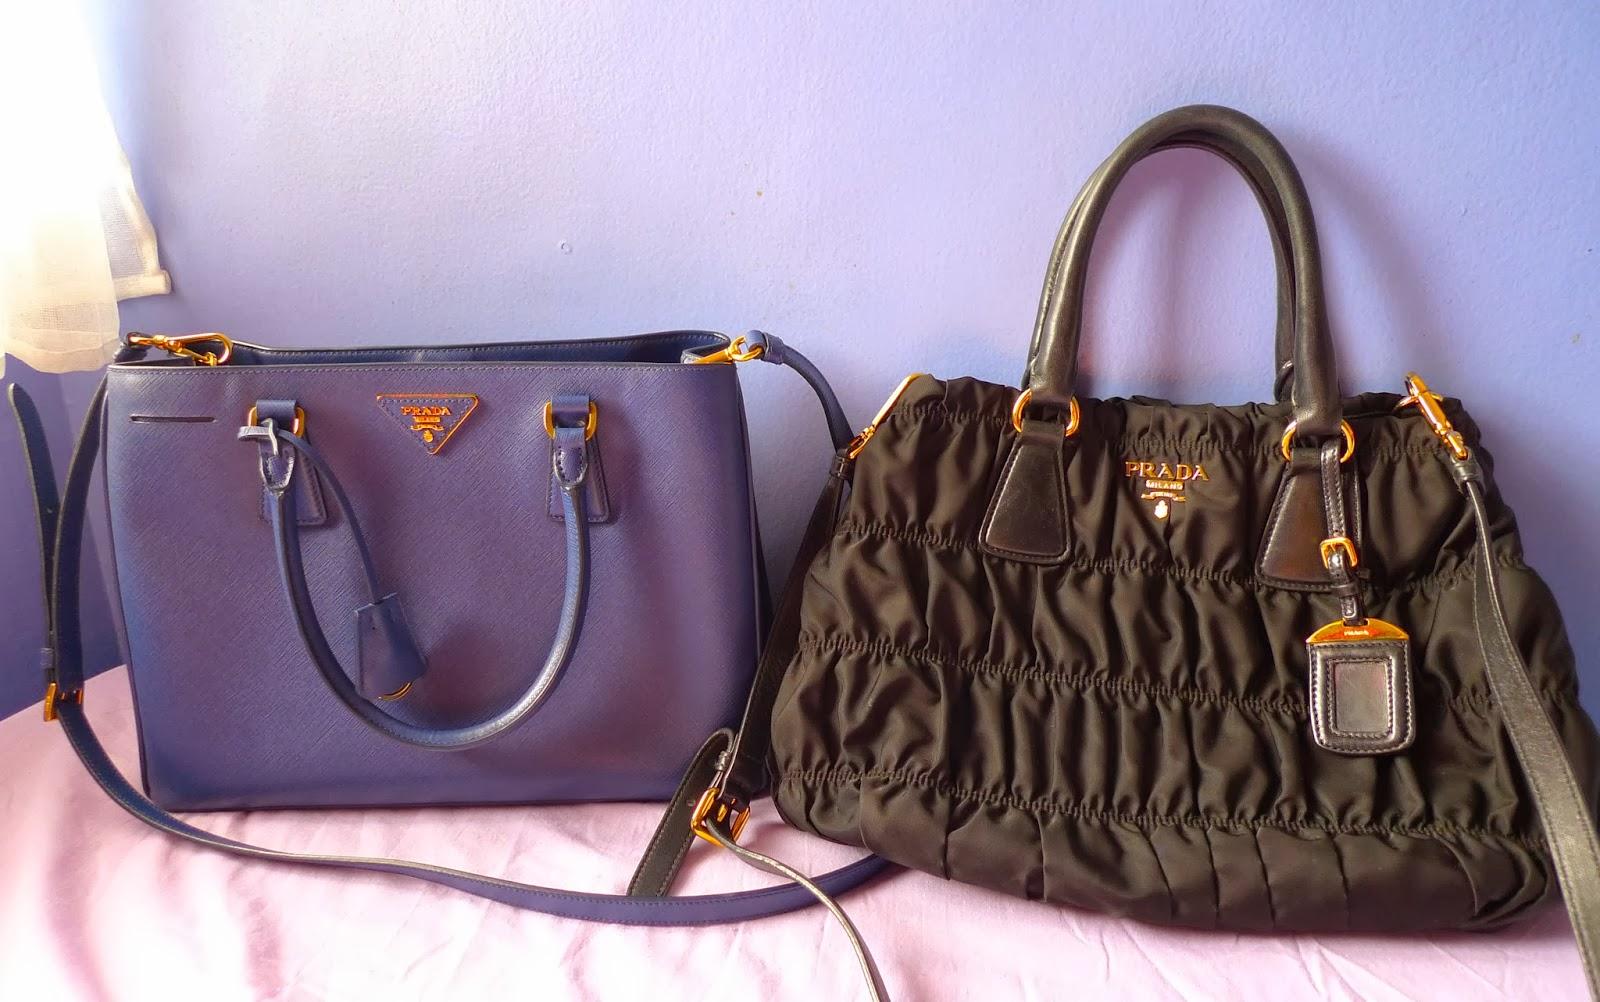 ebcf3faebb0 Prada Bags Price Philippines apgtechnology.co.uk